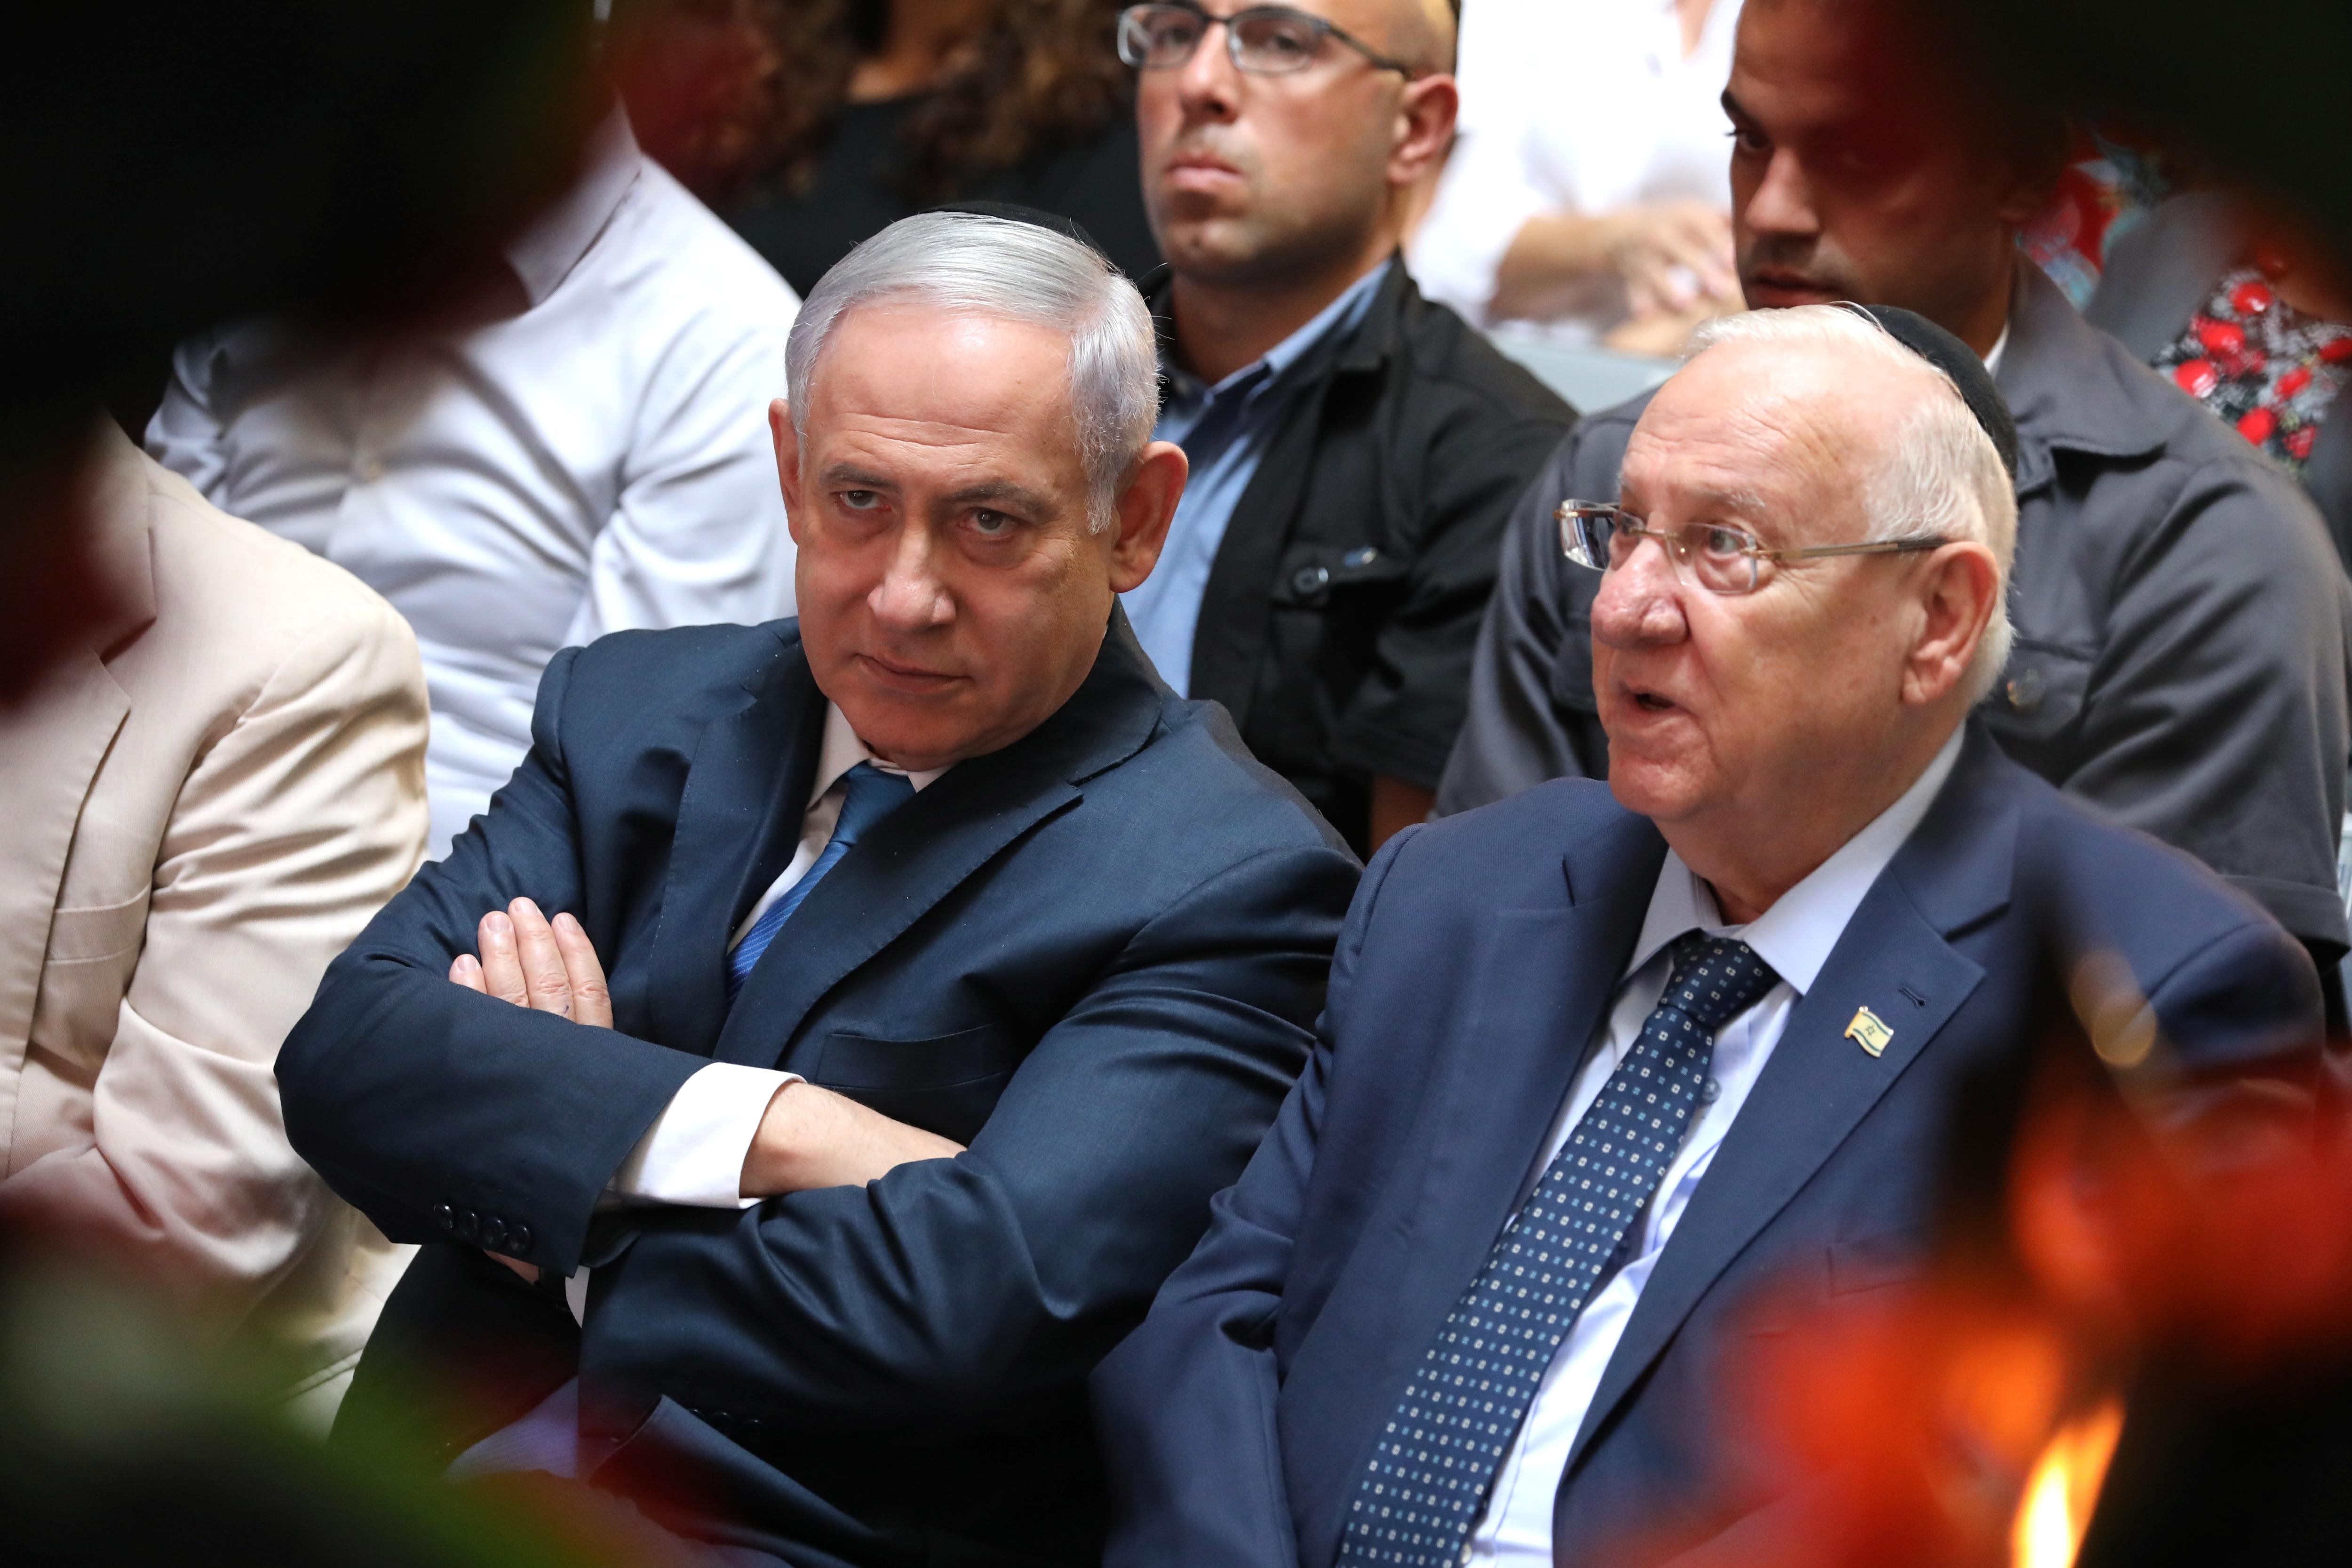 Israeli Prime Minister Benjamin Netanyahu (left) and Israeli President Reuven Rivlin. Mr Rivlin says he will ask Gantz to try to form government.